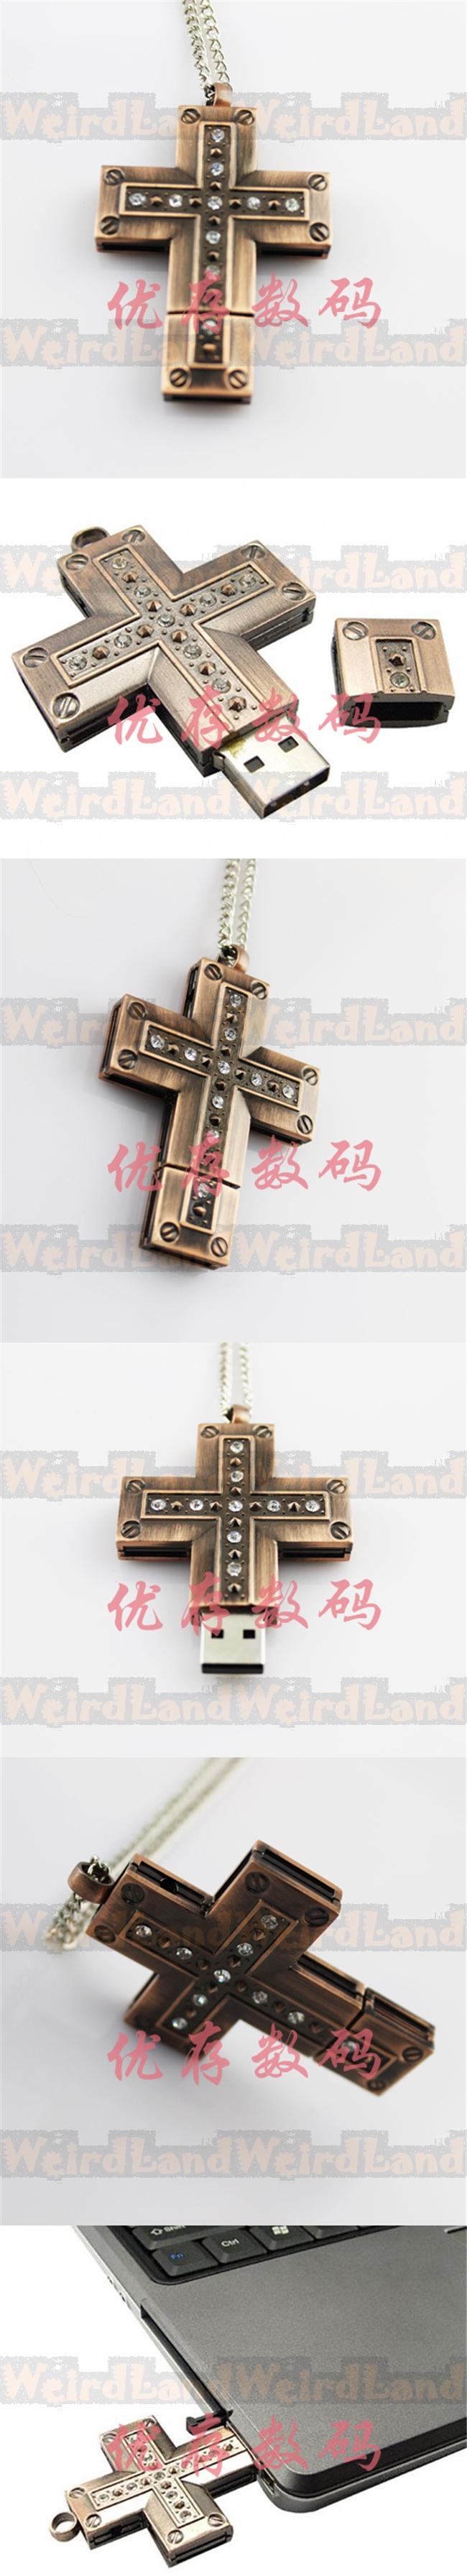 Stitch USB Stick 32GB Quality 3D USB Flash Drives WeirdLand